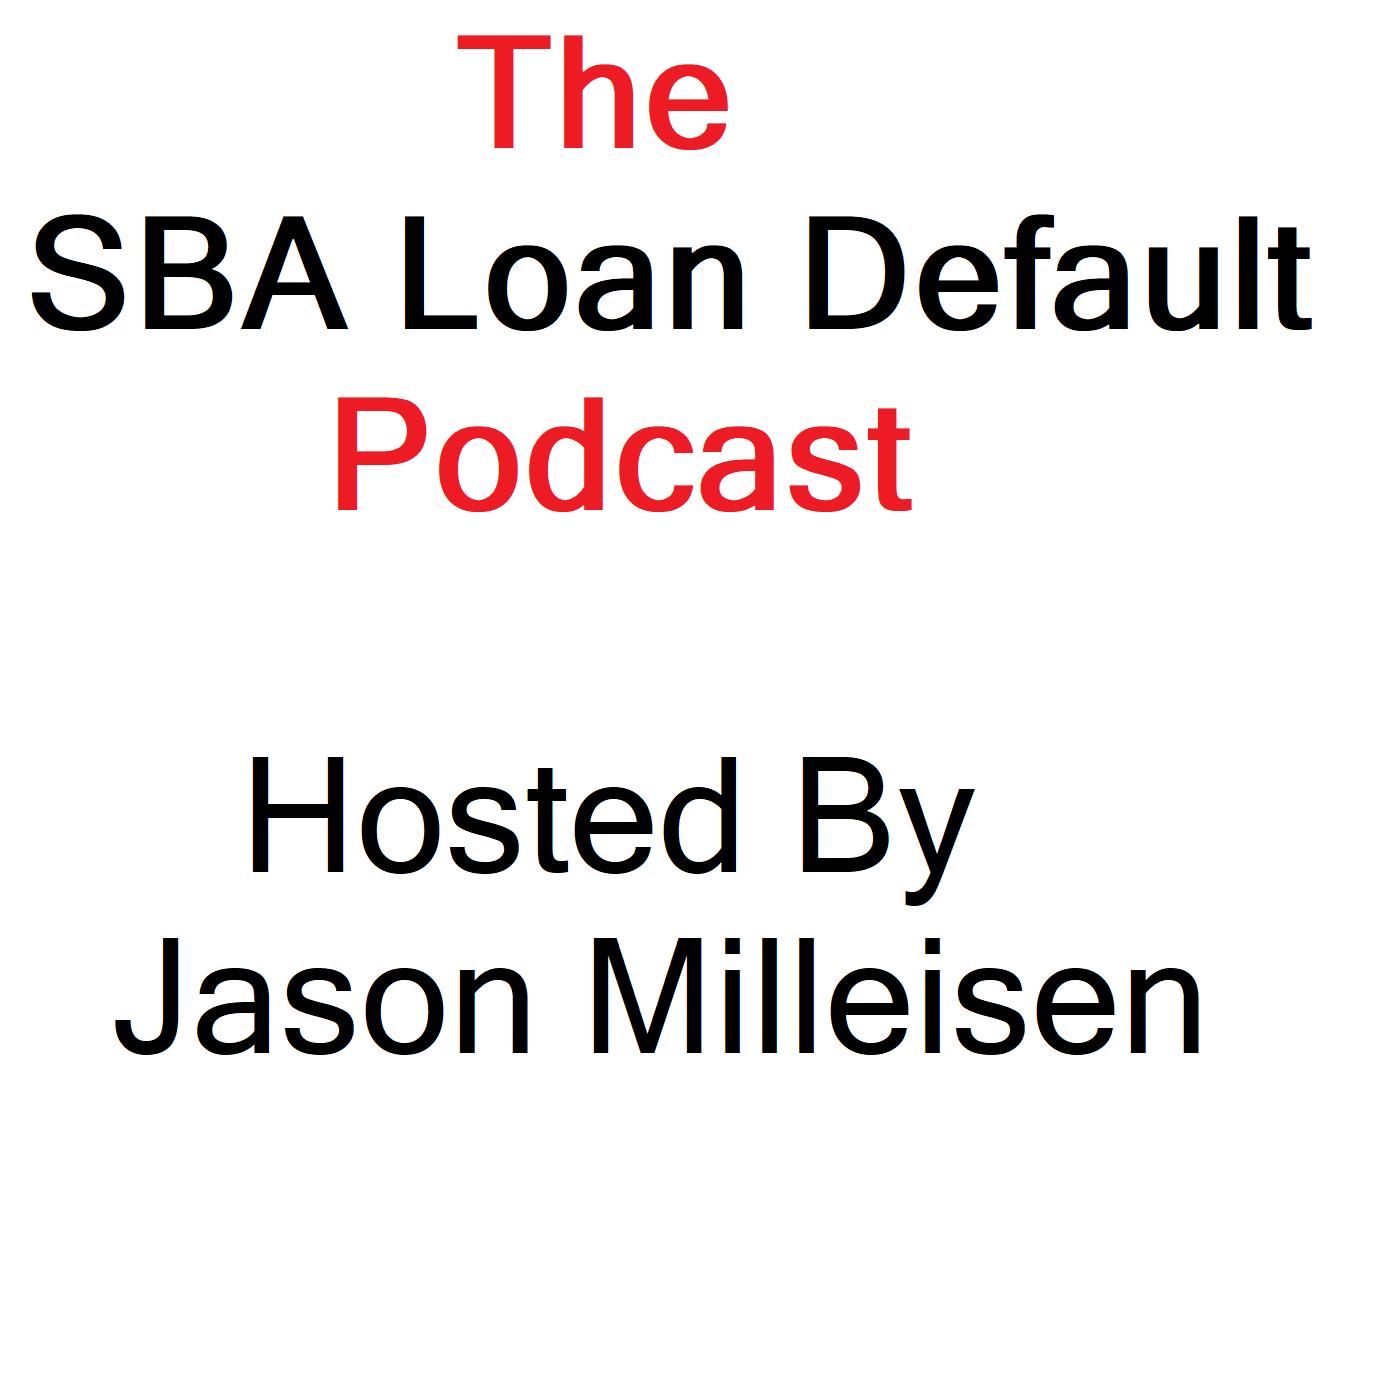 SBA Loan Default Podcast show art